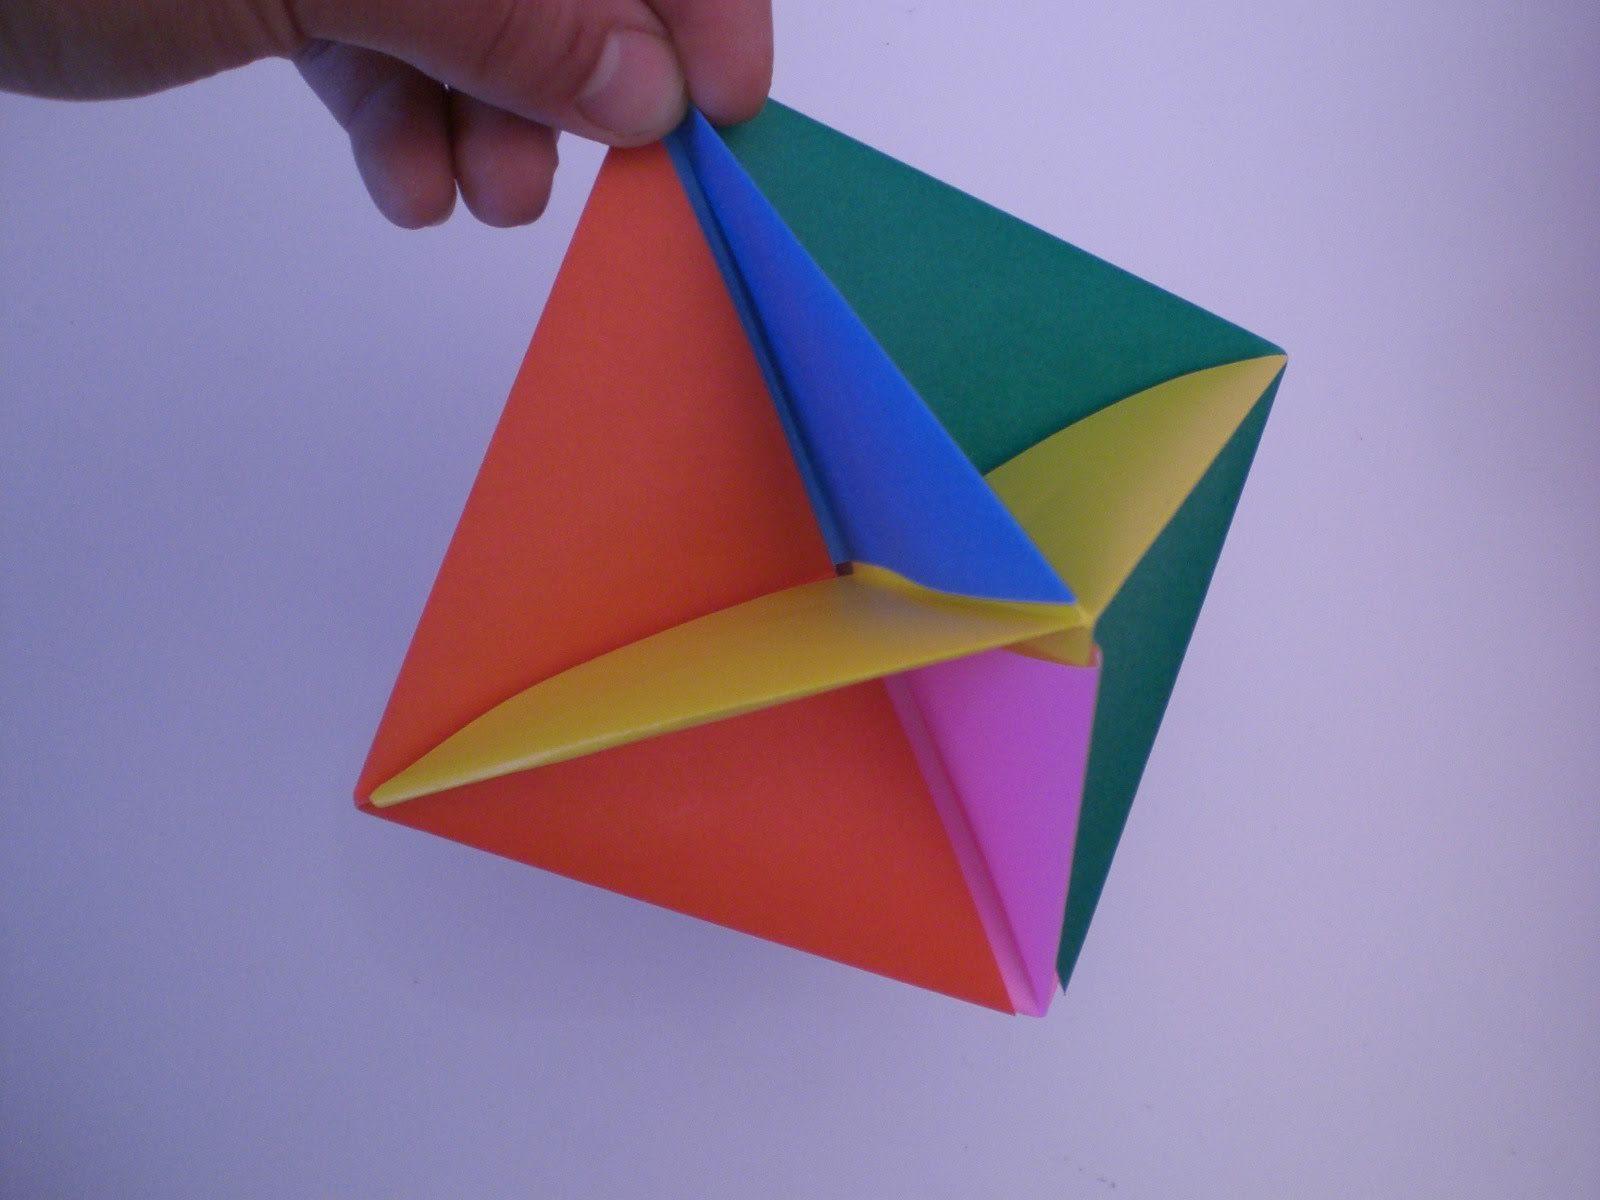 Origami executive toy | makes paper | Pinterest | Origami ... - photo#15